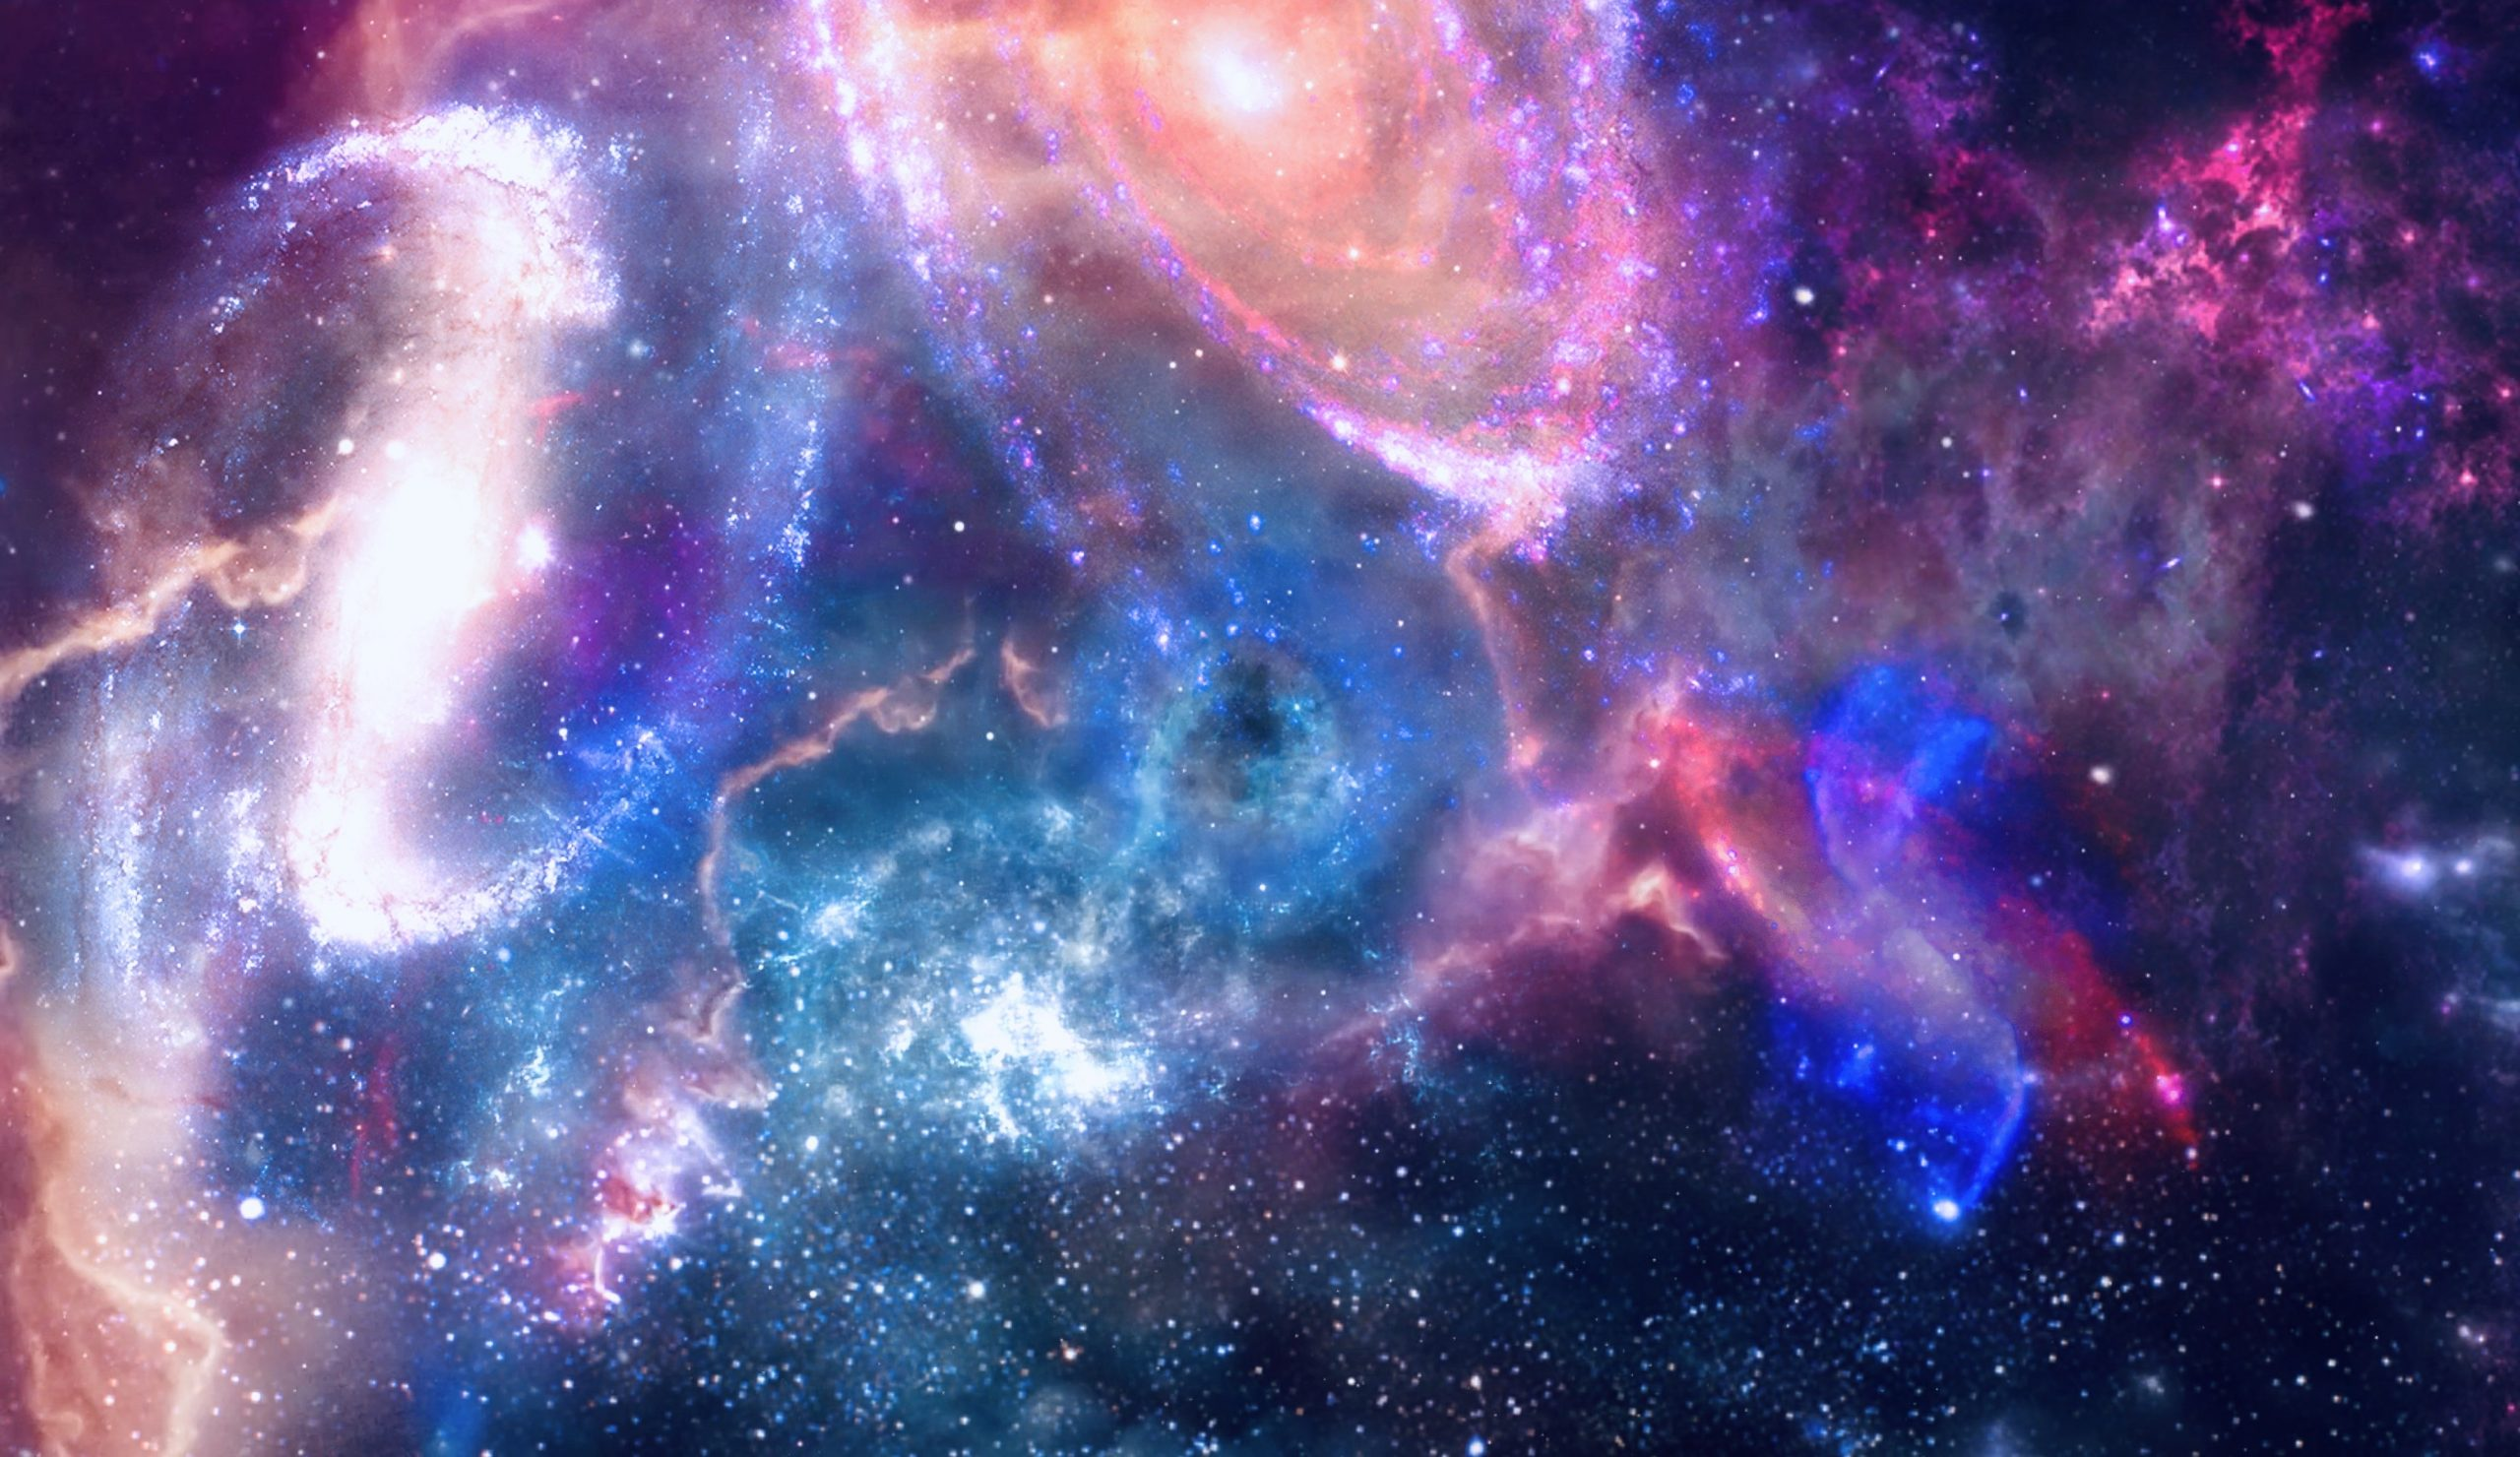 black hole planets and galaxy VJSJVYR scaled